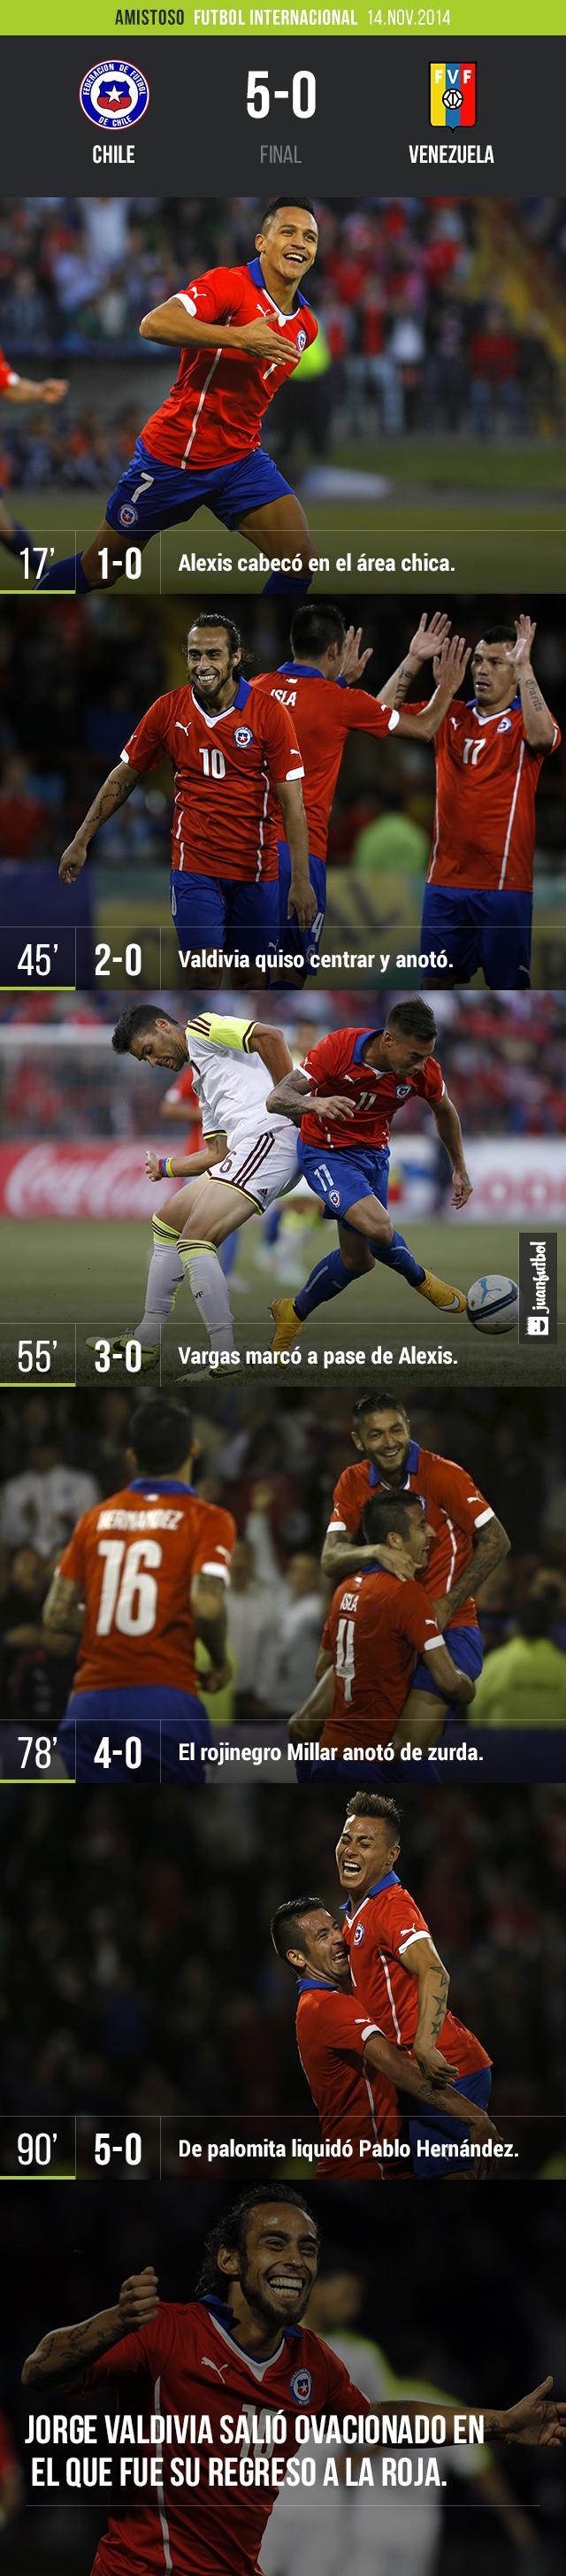 Chile vs. Venezuela